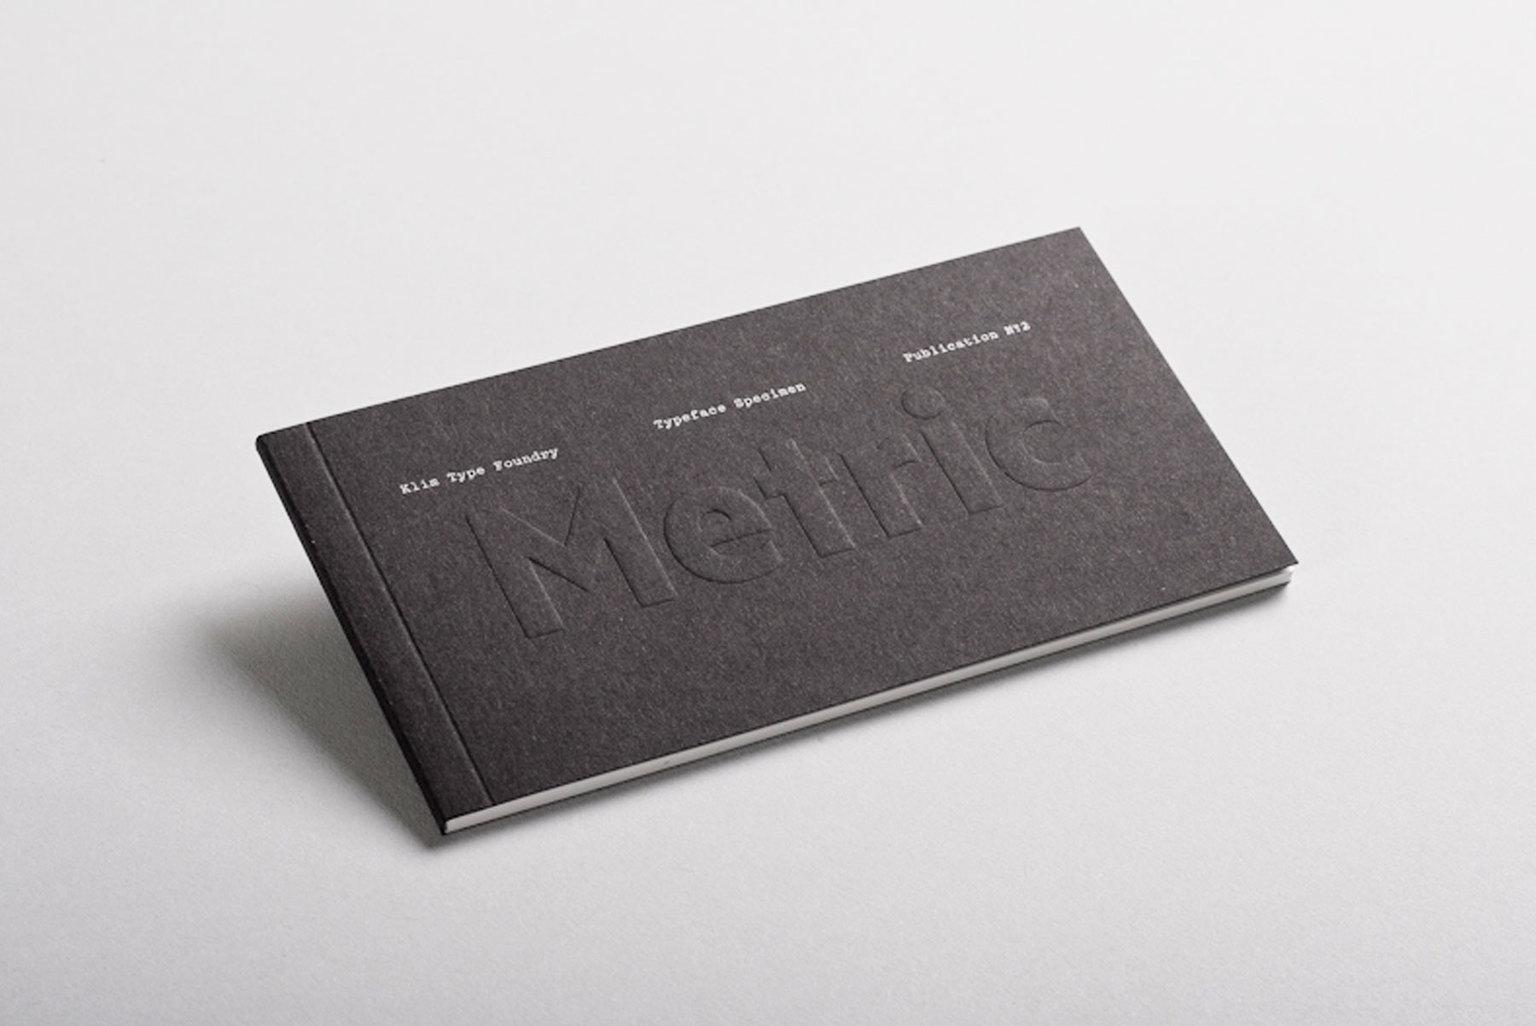 Vllg klim metric specimen